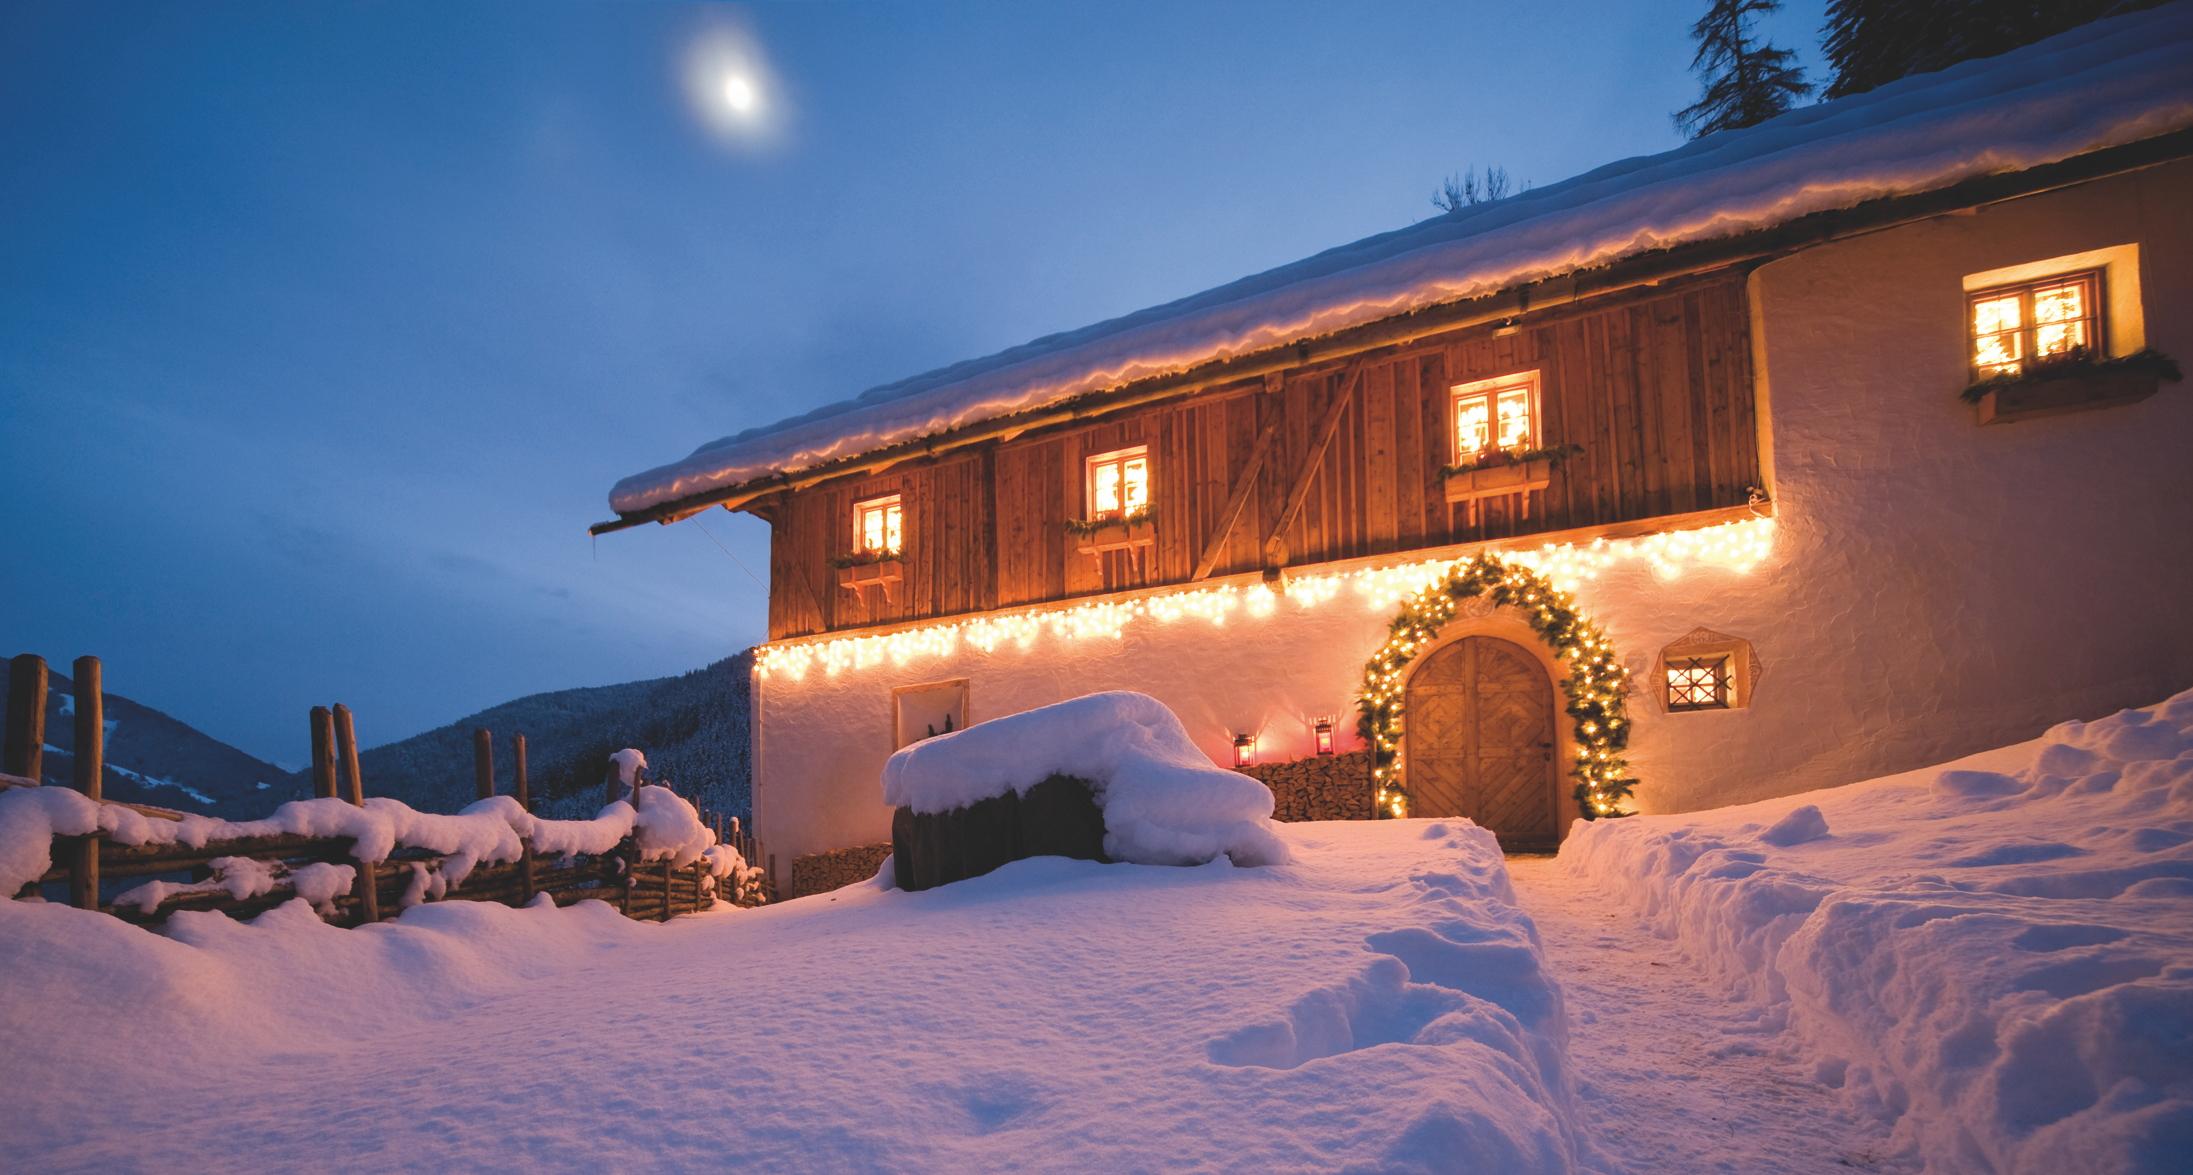 luxus chalets in den alpen domizile reisen spezialist. Black Bedroom Furniture Sets. Home Design Ideas